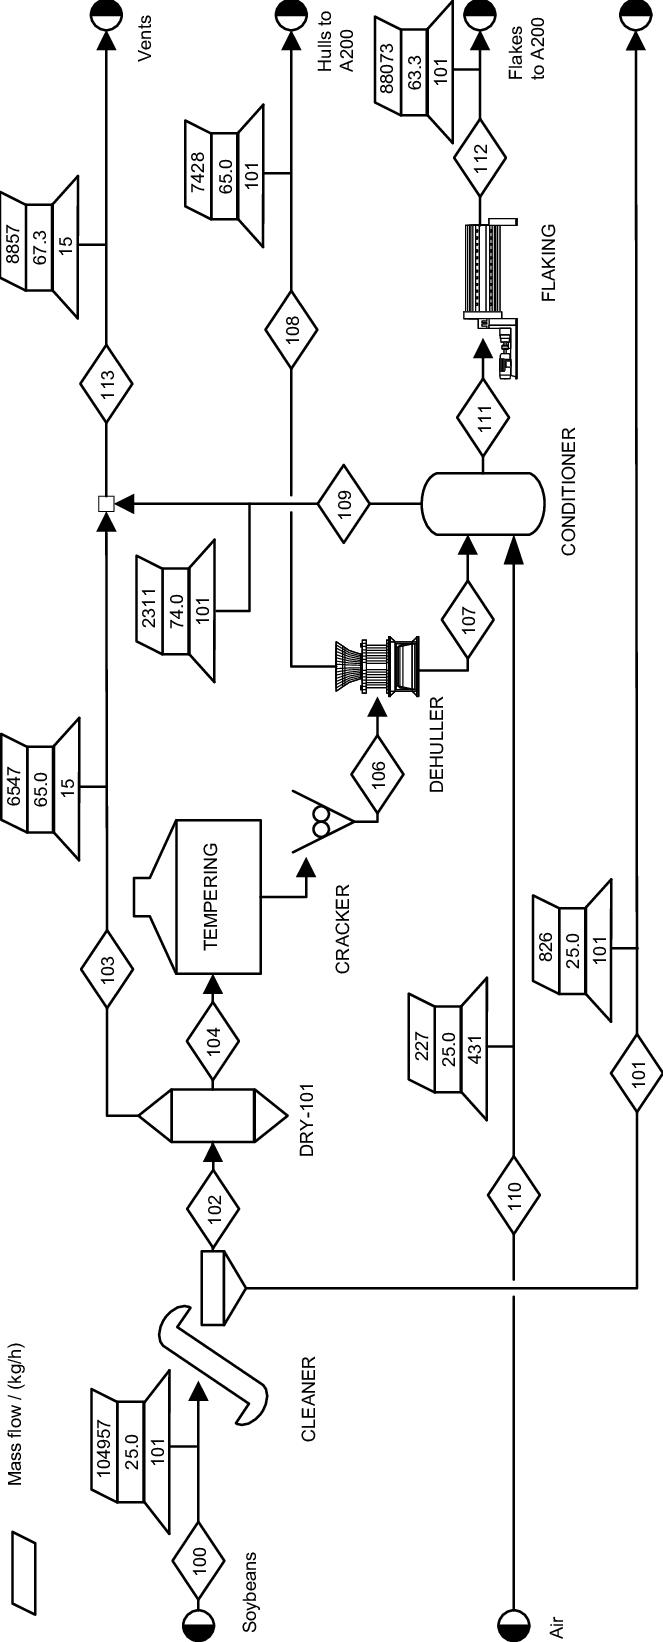 Process flow diagram of soybeans preparation area (A100